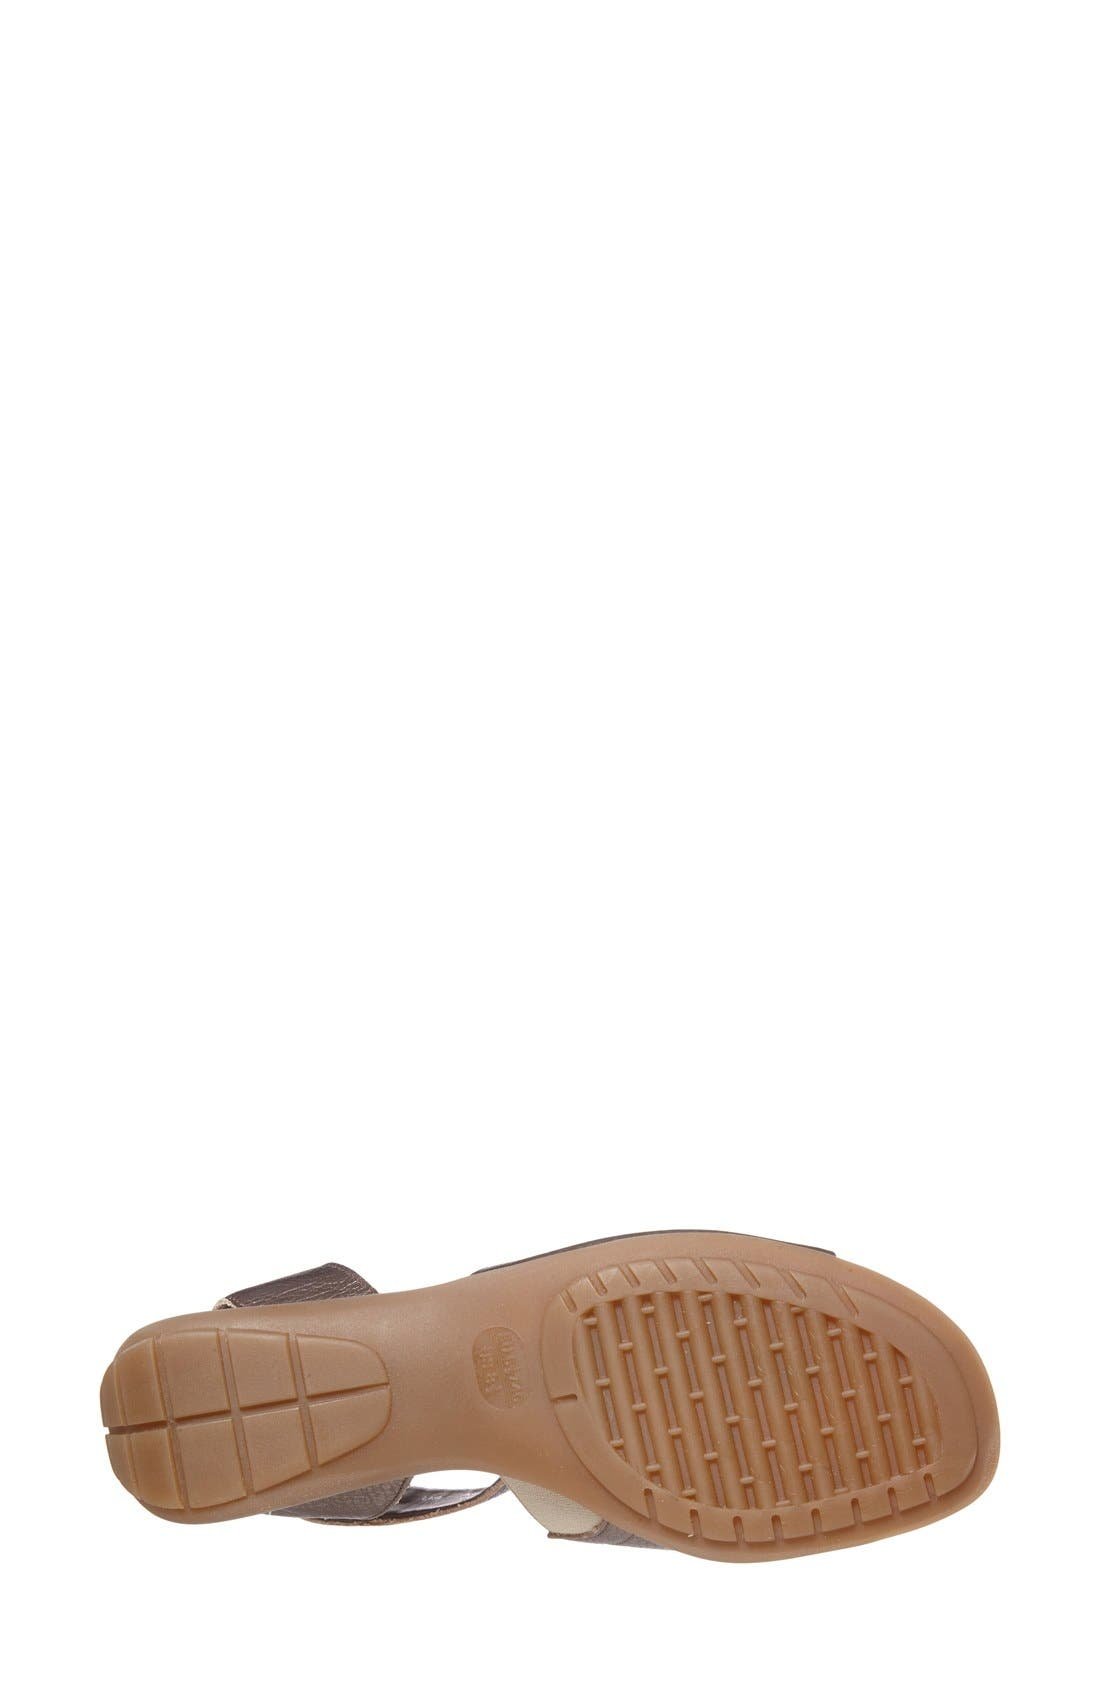 'Beglad' Leather Ankle Strap Sandal,                             Alternate thumbnail 56, color,